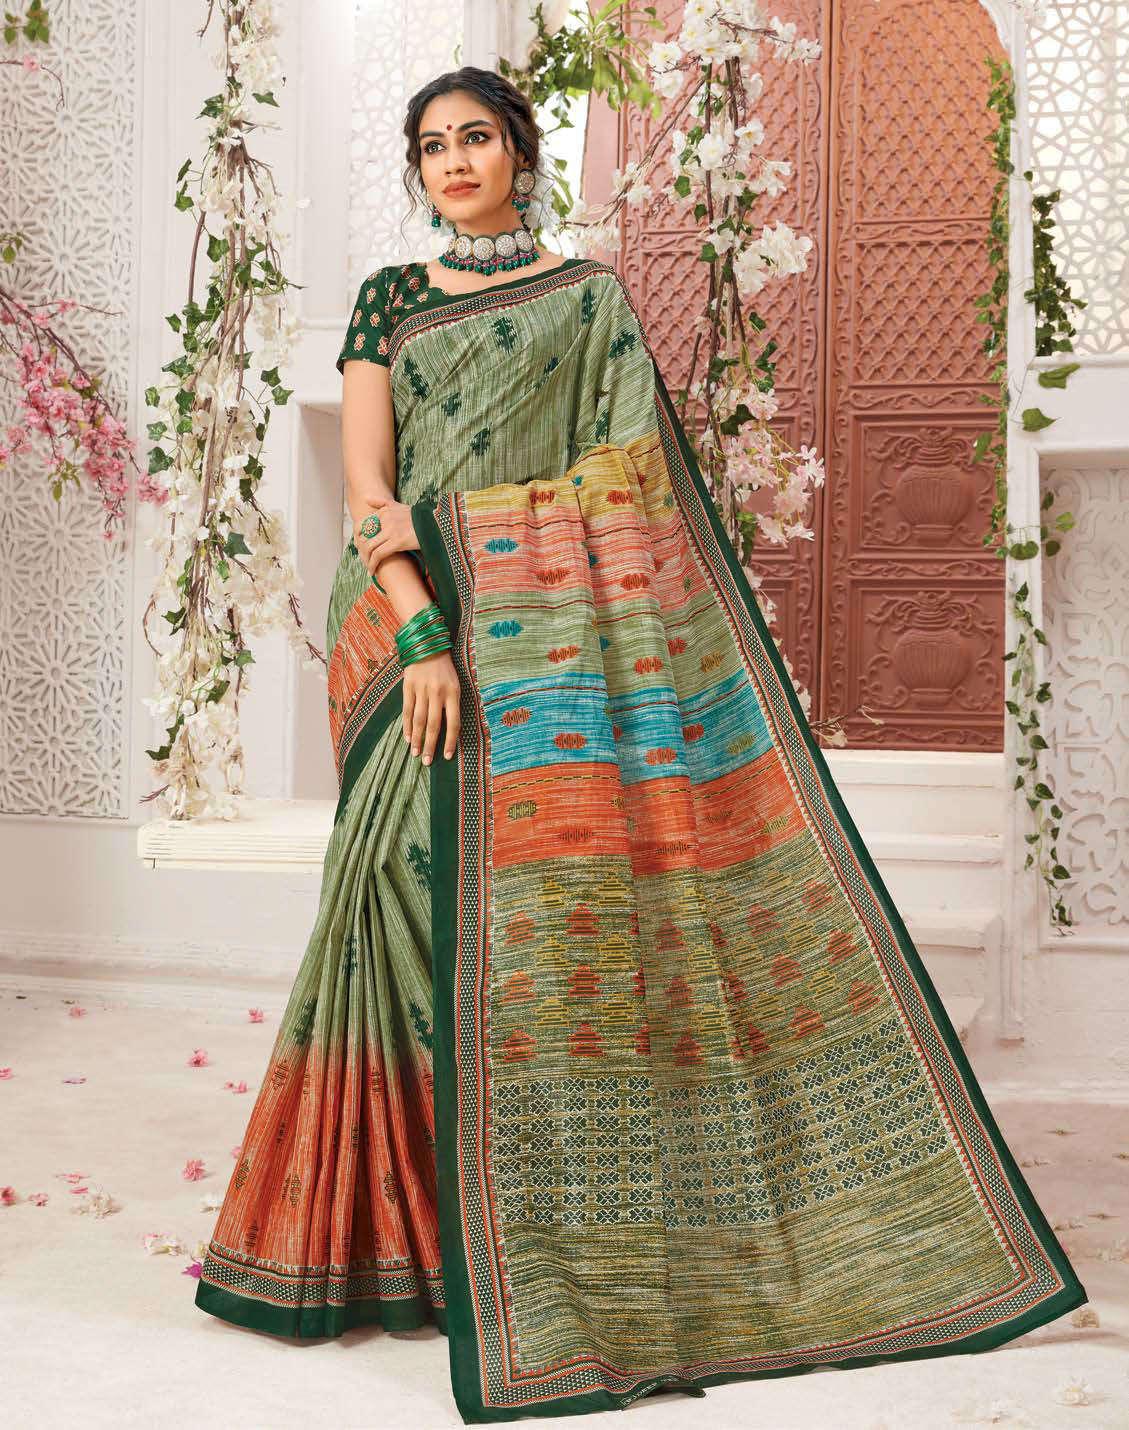 Deeptex Mother India Vol 38 A Saree Sari Wholesale Catalog 18 Pcs 7 - Deeptex Mother India Vol 38 A Saree Sari Wholesale Catalog 18 Pcs